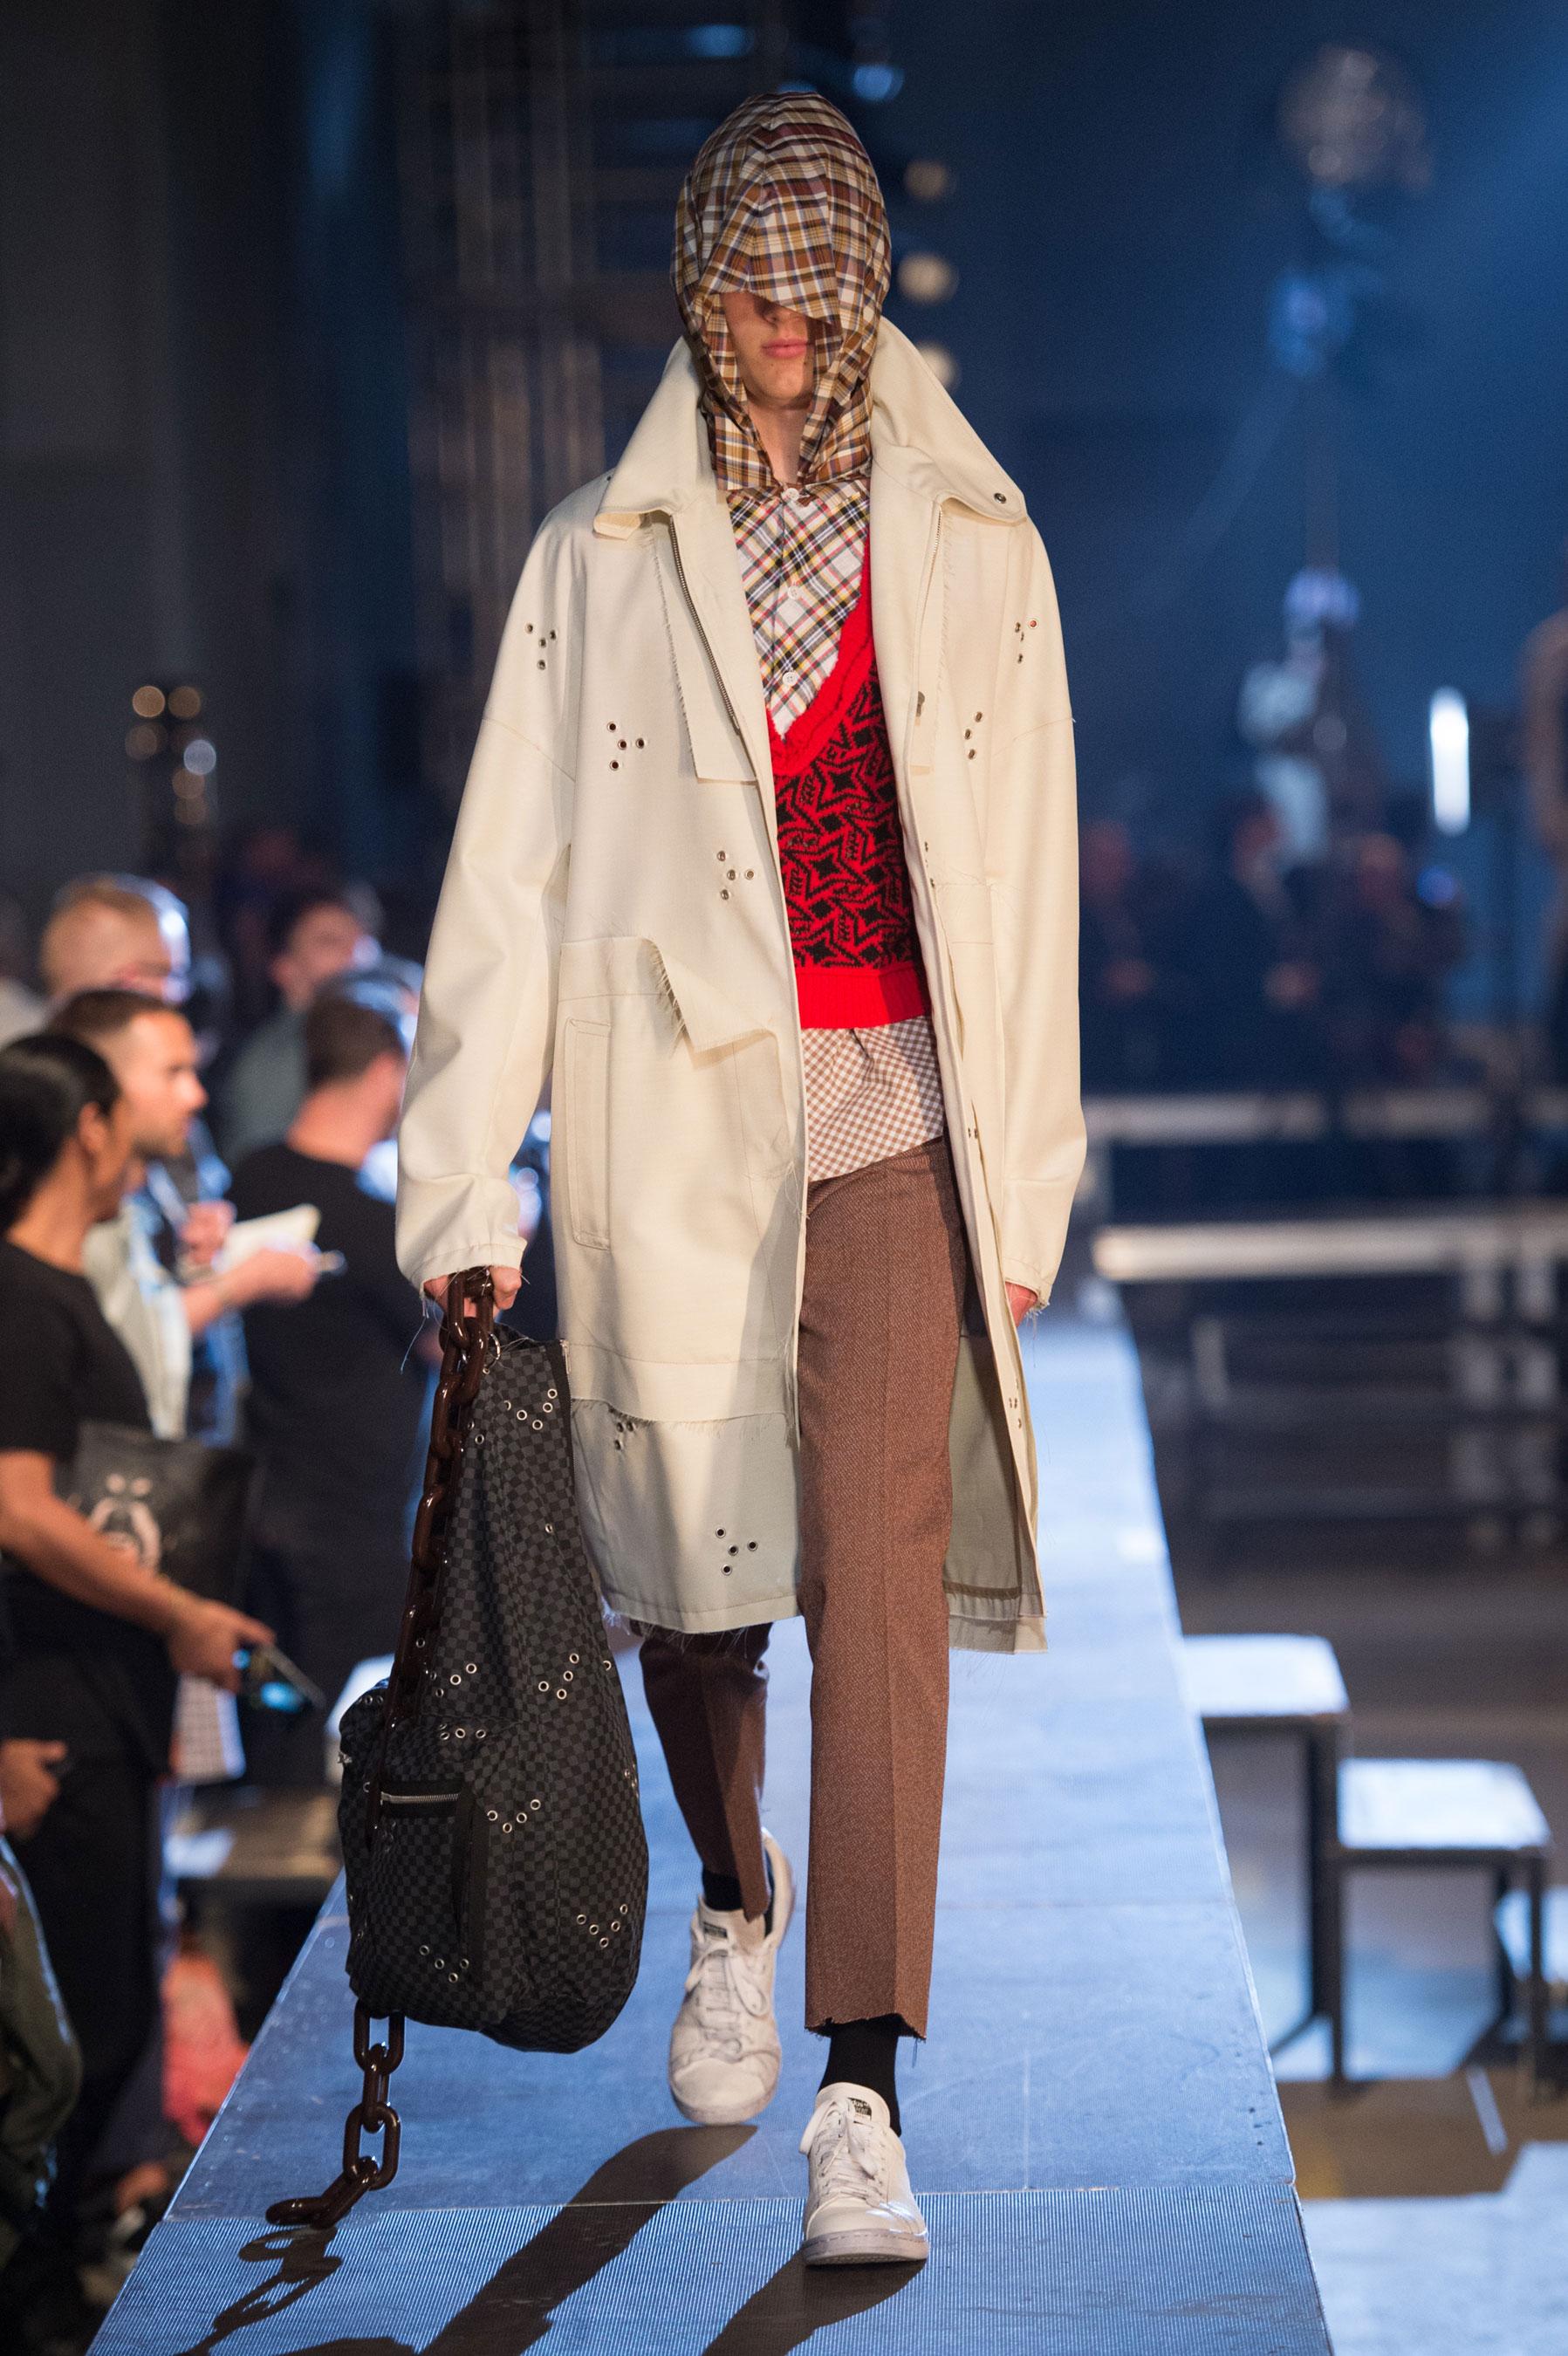 Raf Simons Spring/Summer 2016 Menswear Collection | Paris Fashion Week